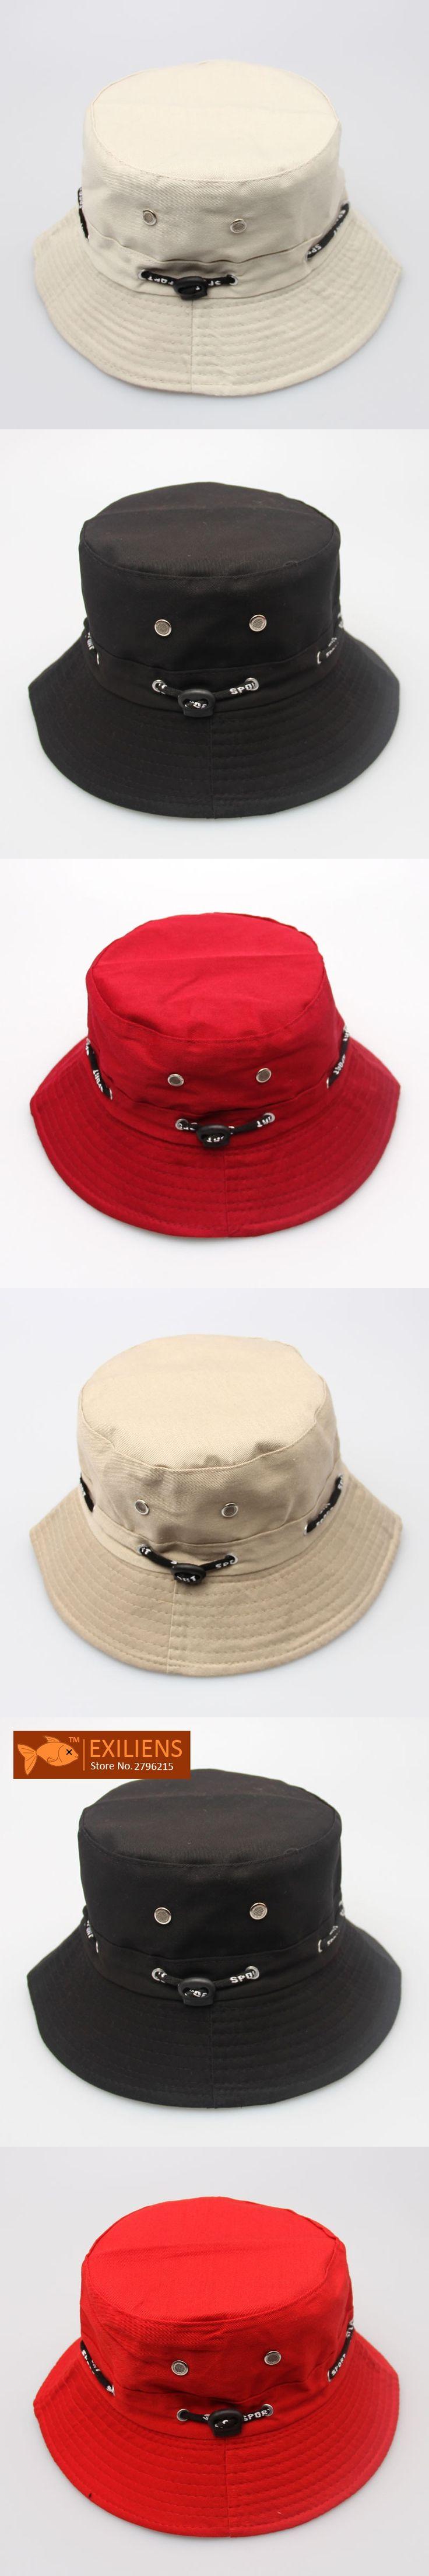 [EXILIENS] 2017 Fashion Brand Bucket Hats Cotton Top Hot Casual Fisherman Caps Hip-hop Hats For Men Women Lovely Black Hat